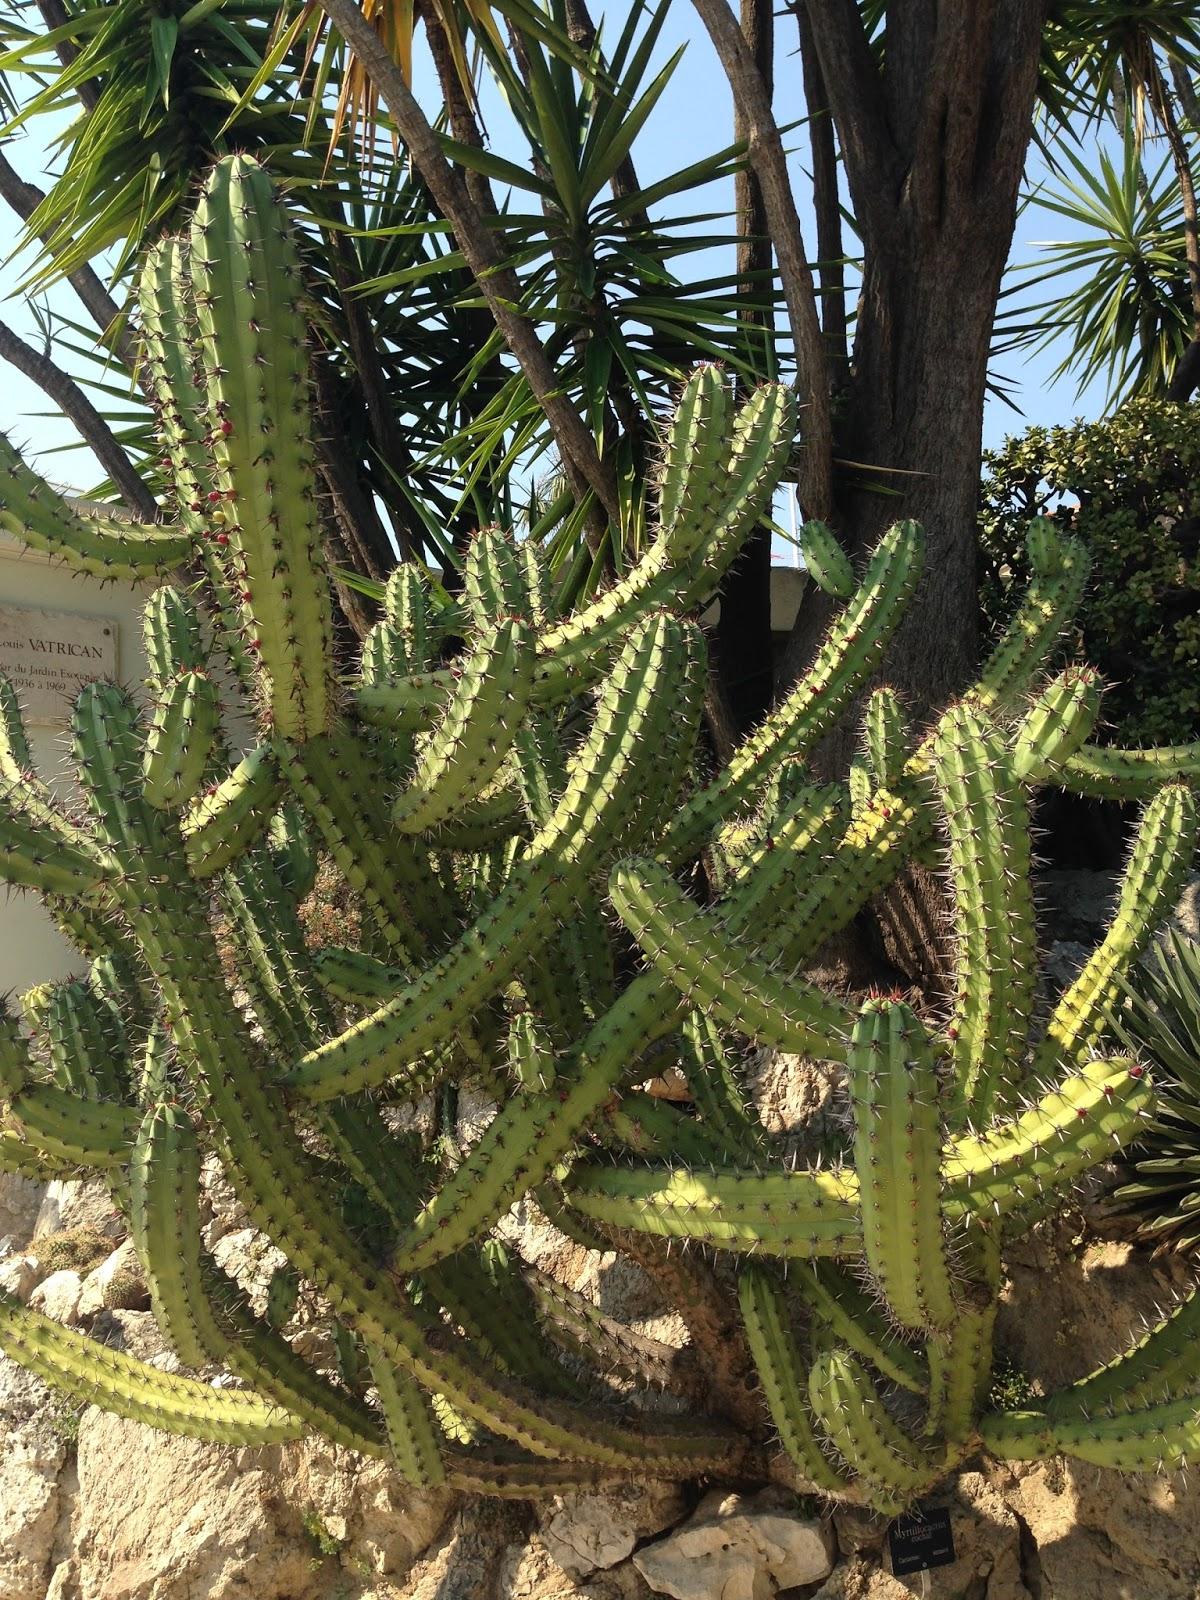 Succulent sundae jardin exotique monaco part 10 for Jardin exotique